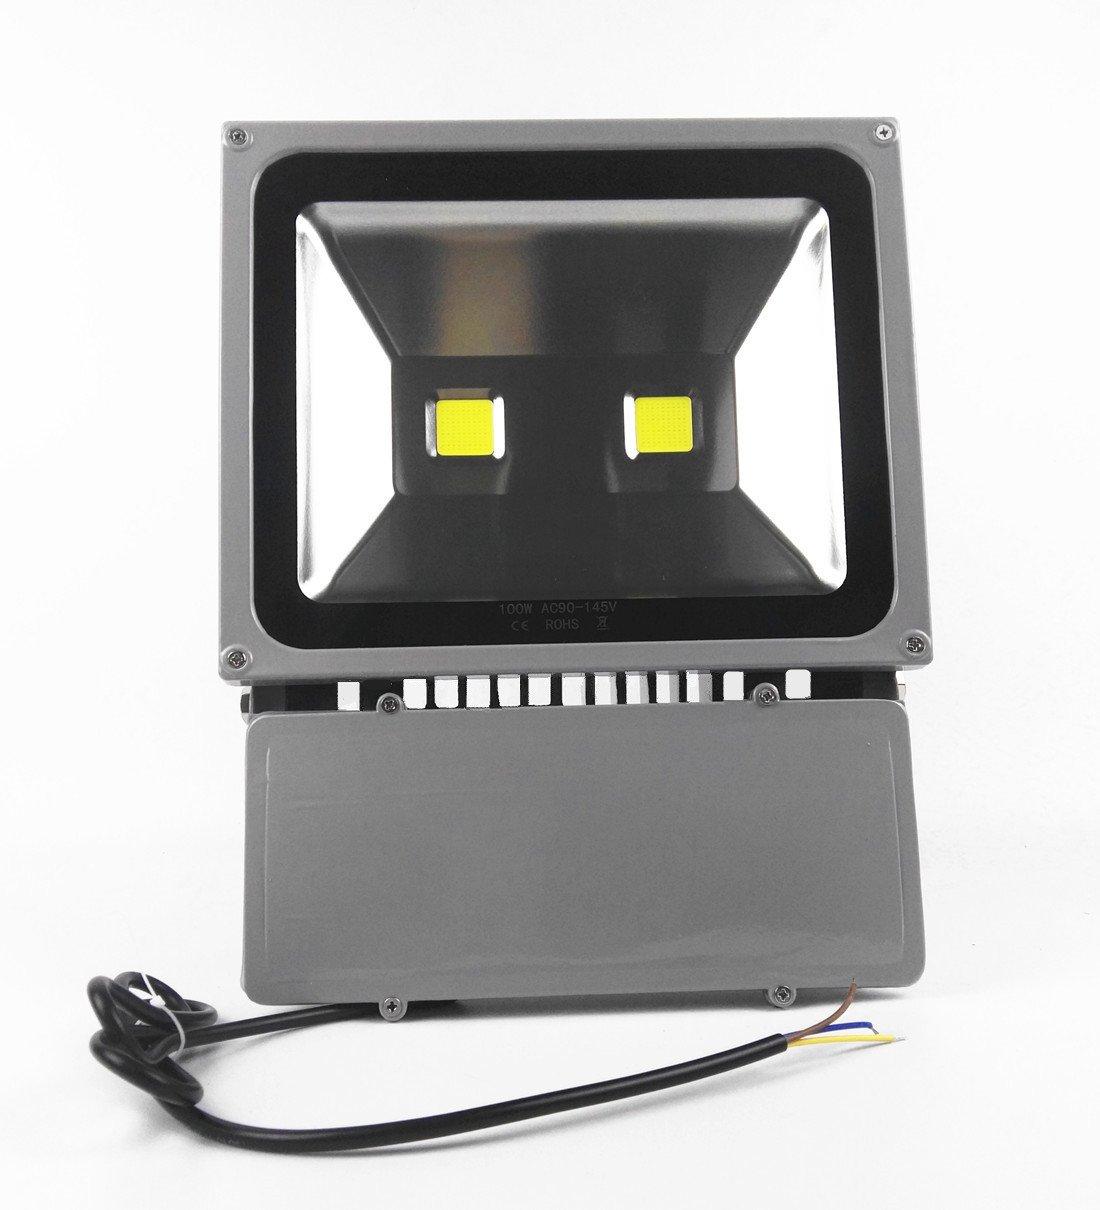 LED Flood light Waterproof Outdoor Lighting - AI YONG LED street lamp Lighting(2017 new design)Daylight White 6000k 100W LED Lighting 110V 100% Aluminum finish life>50,000h,2-year warranty